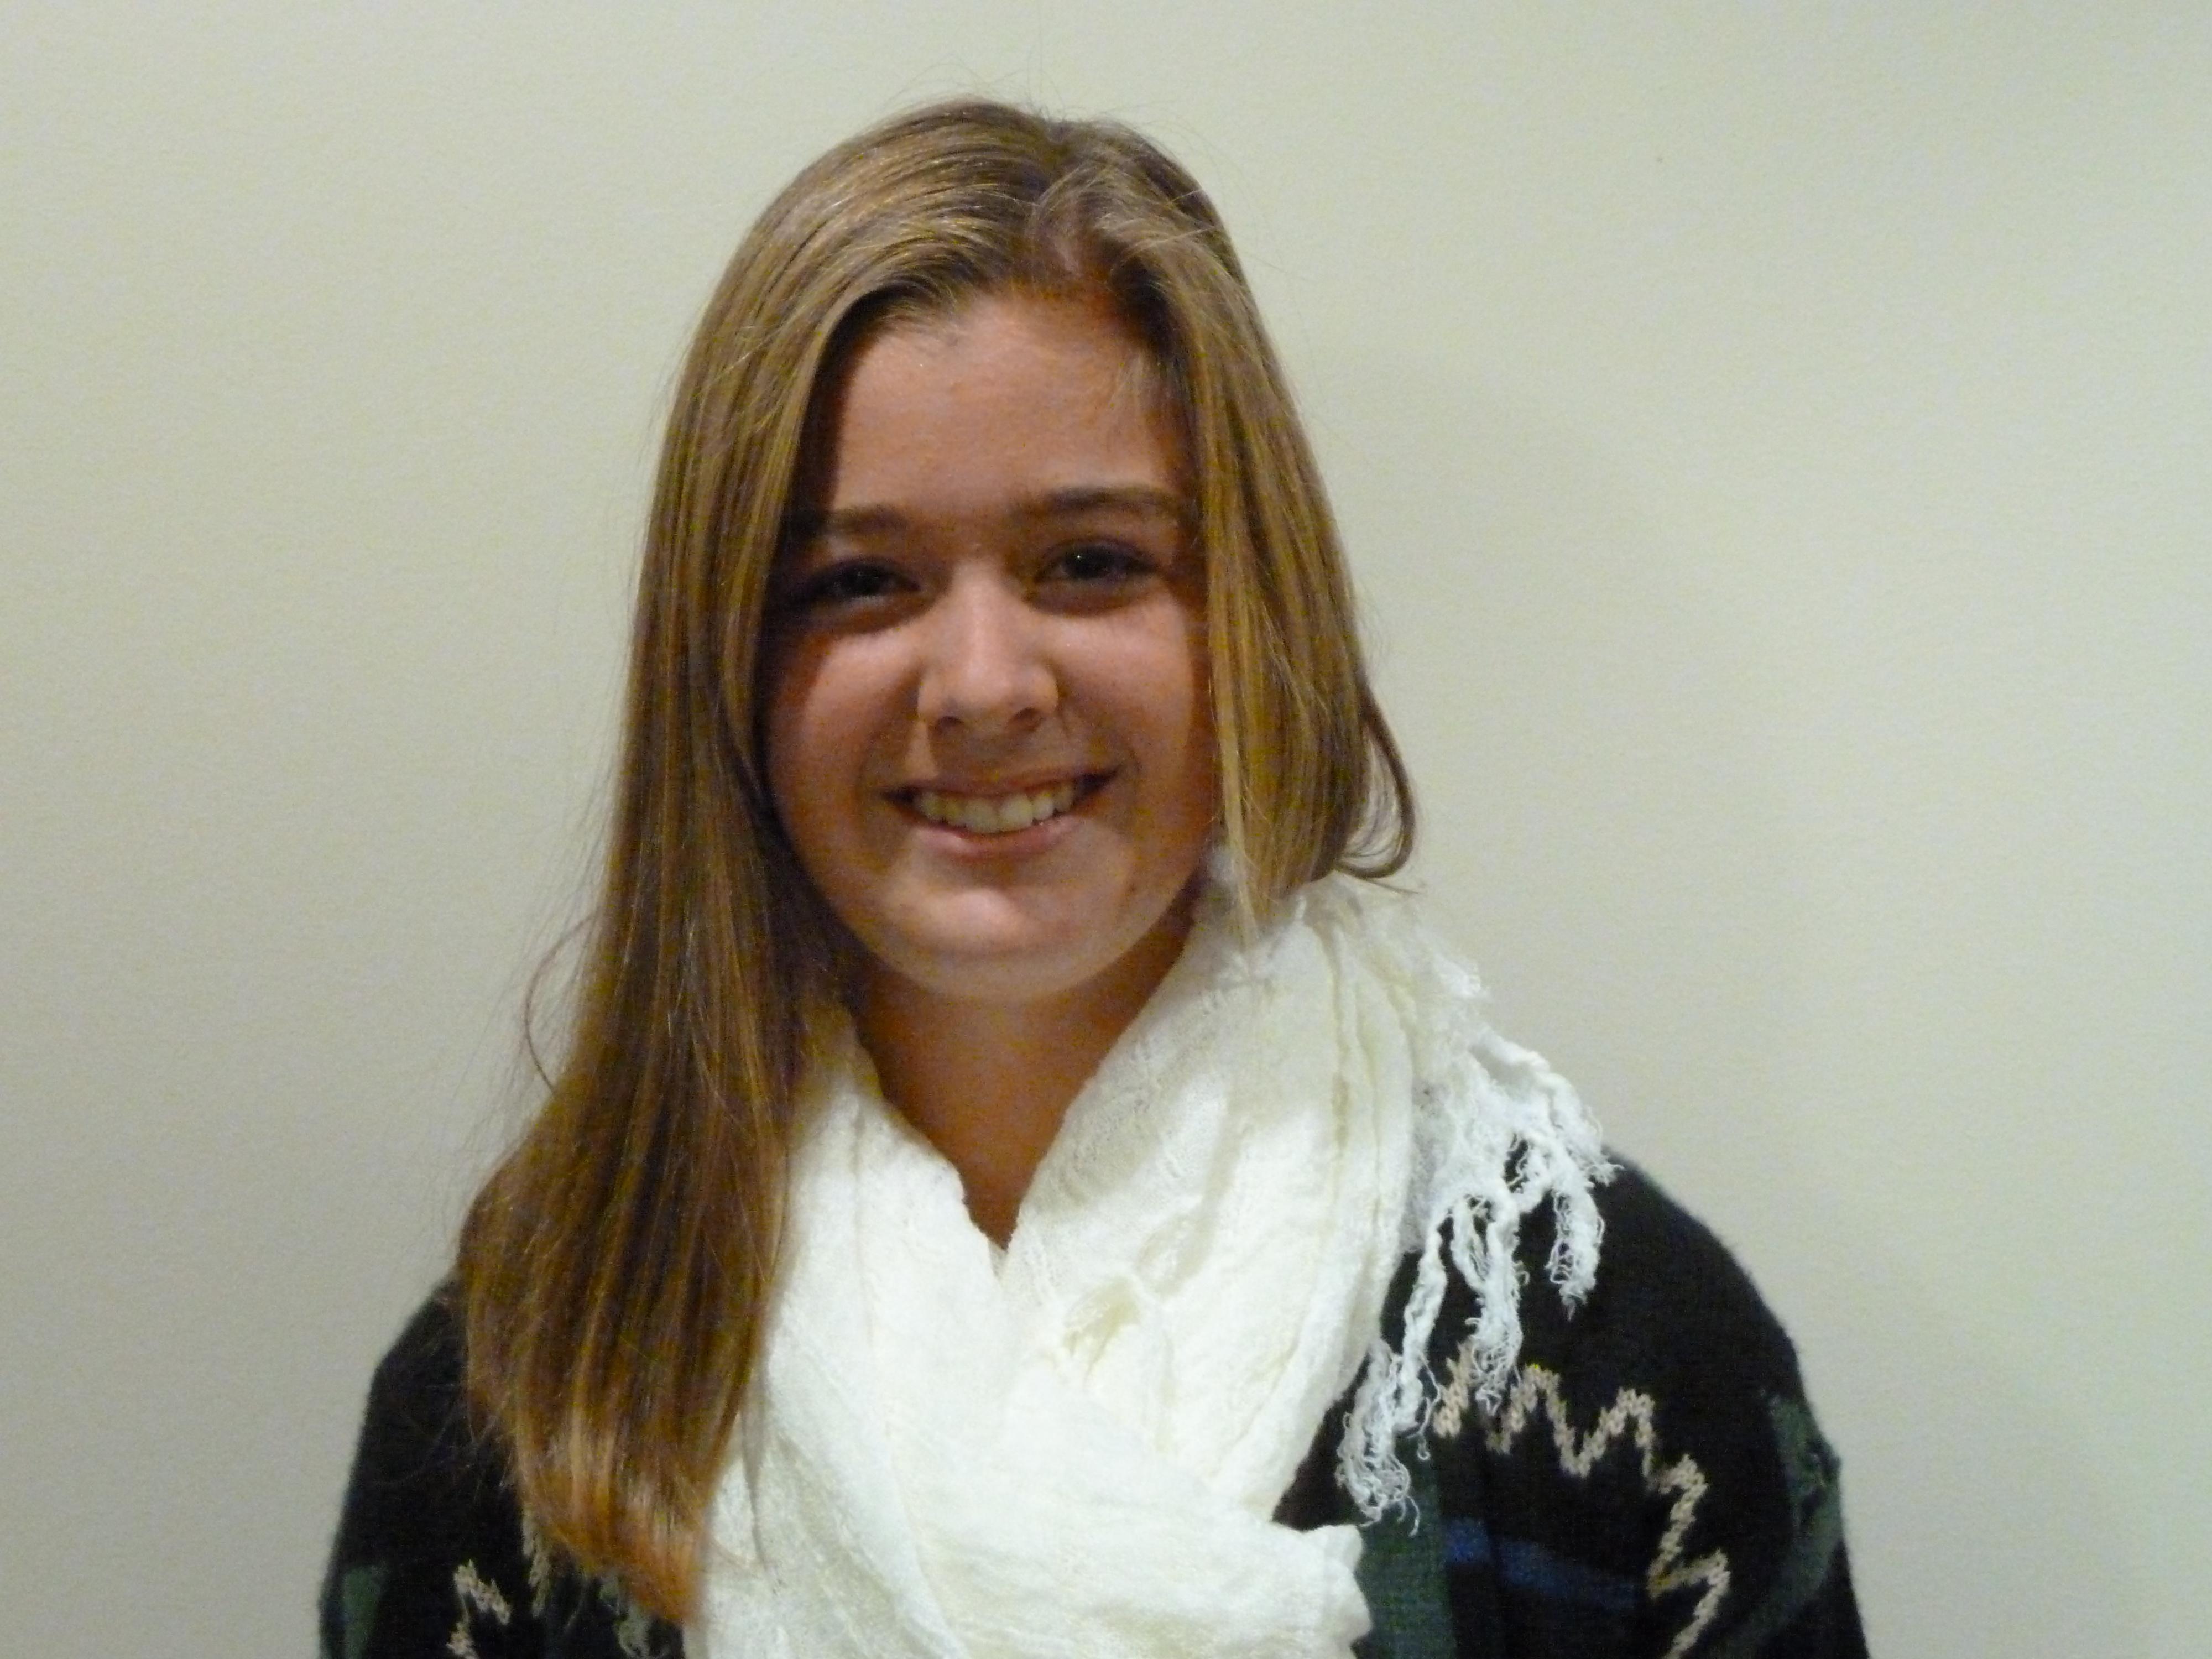 Sprague senior Emily Schmelling